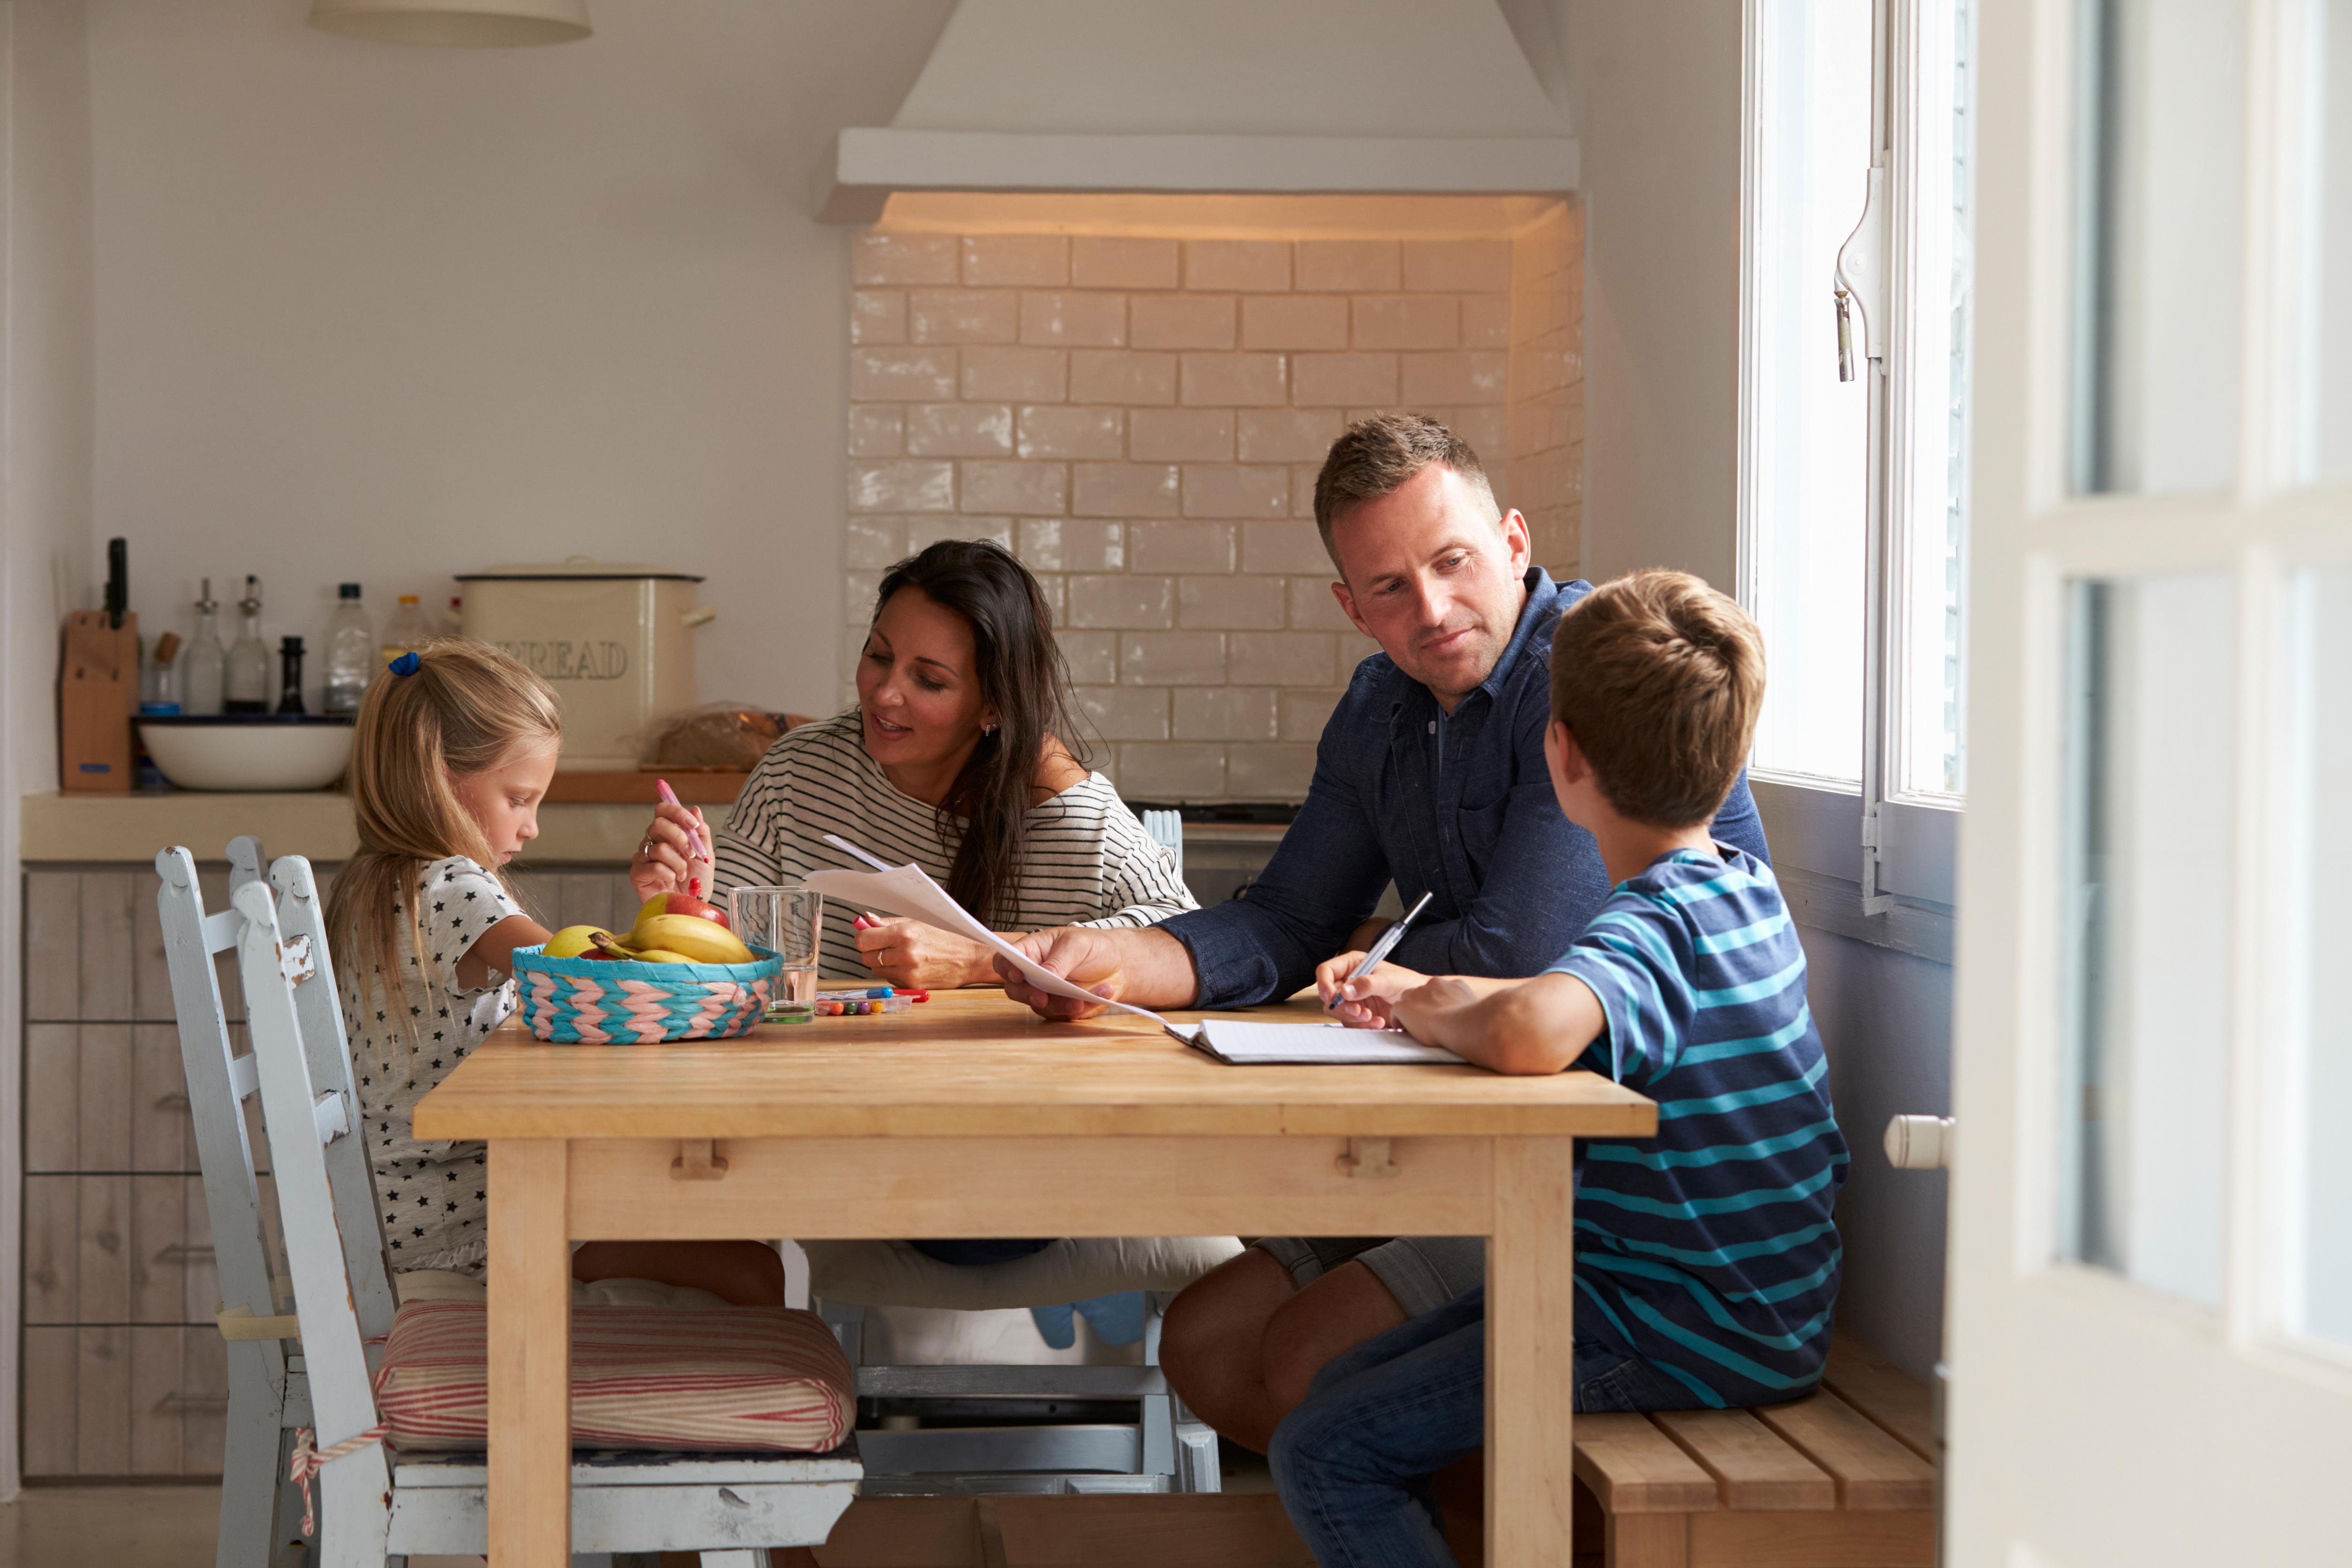 Proposed UK homeschooling guidelines